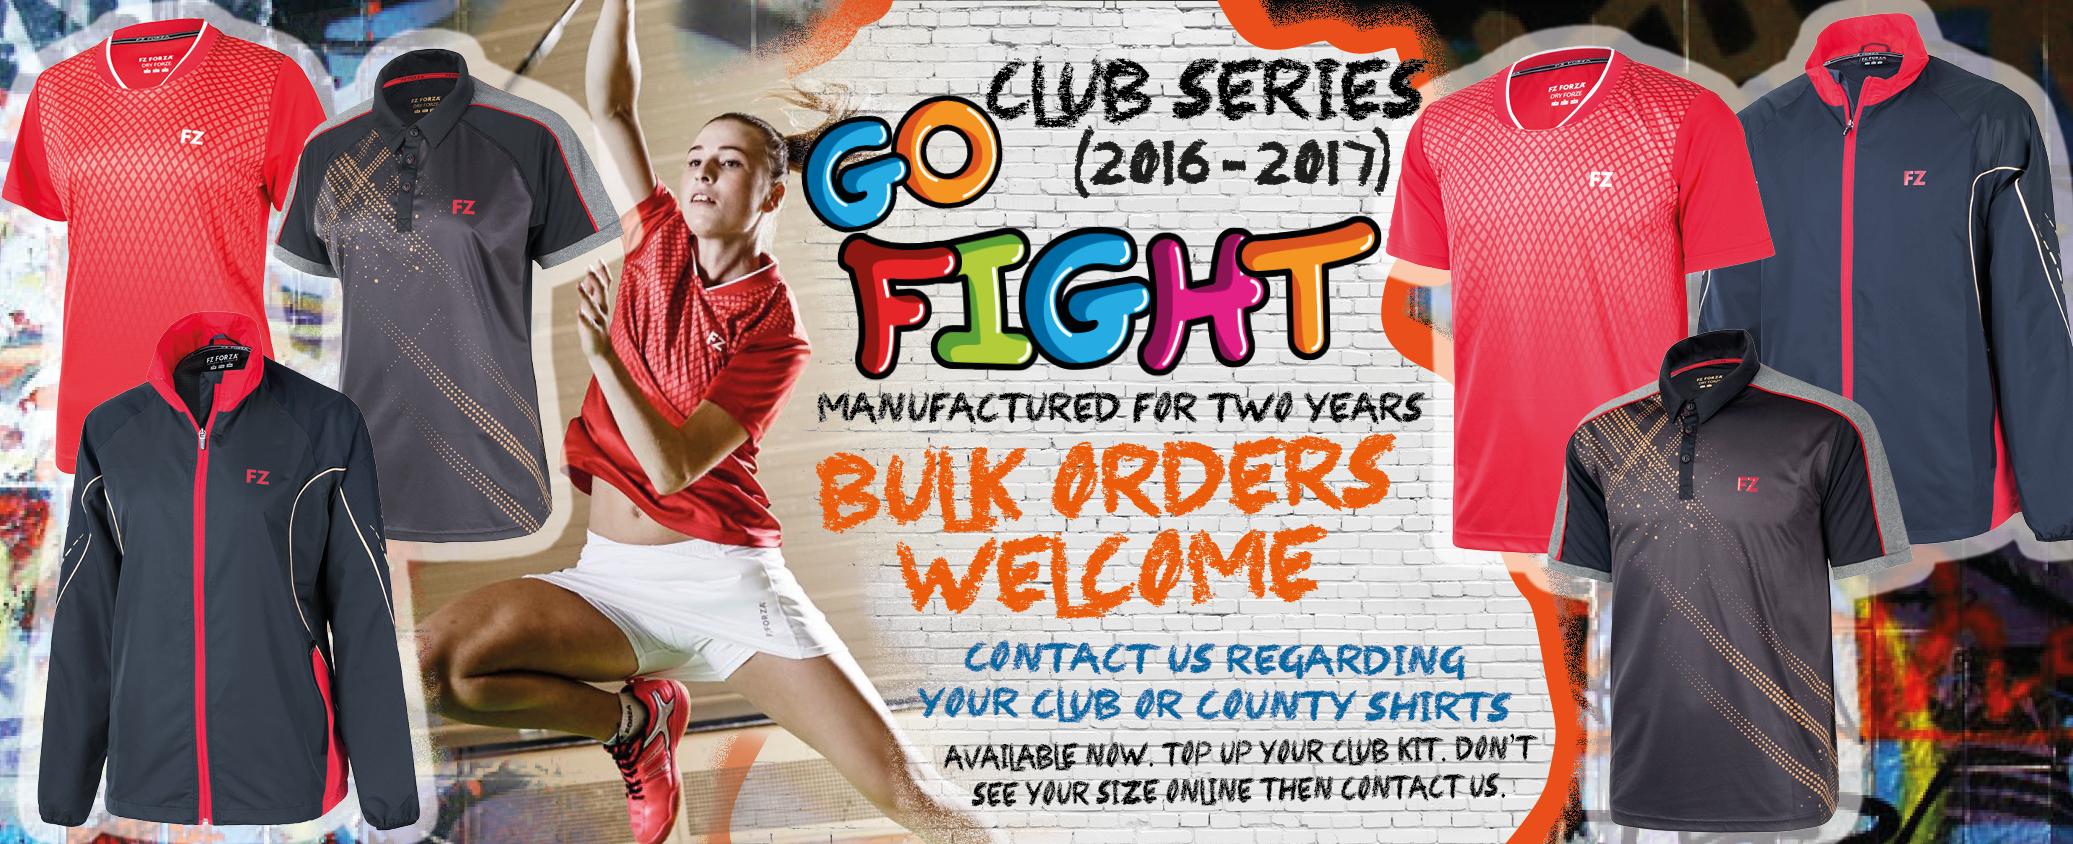 Go Fight - Club Series